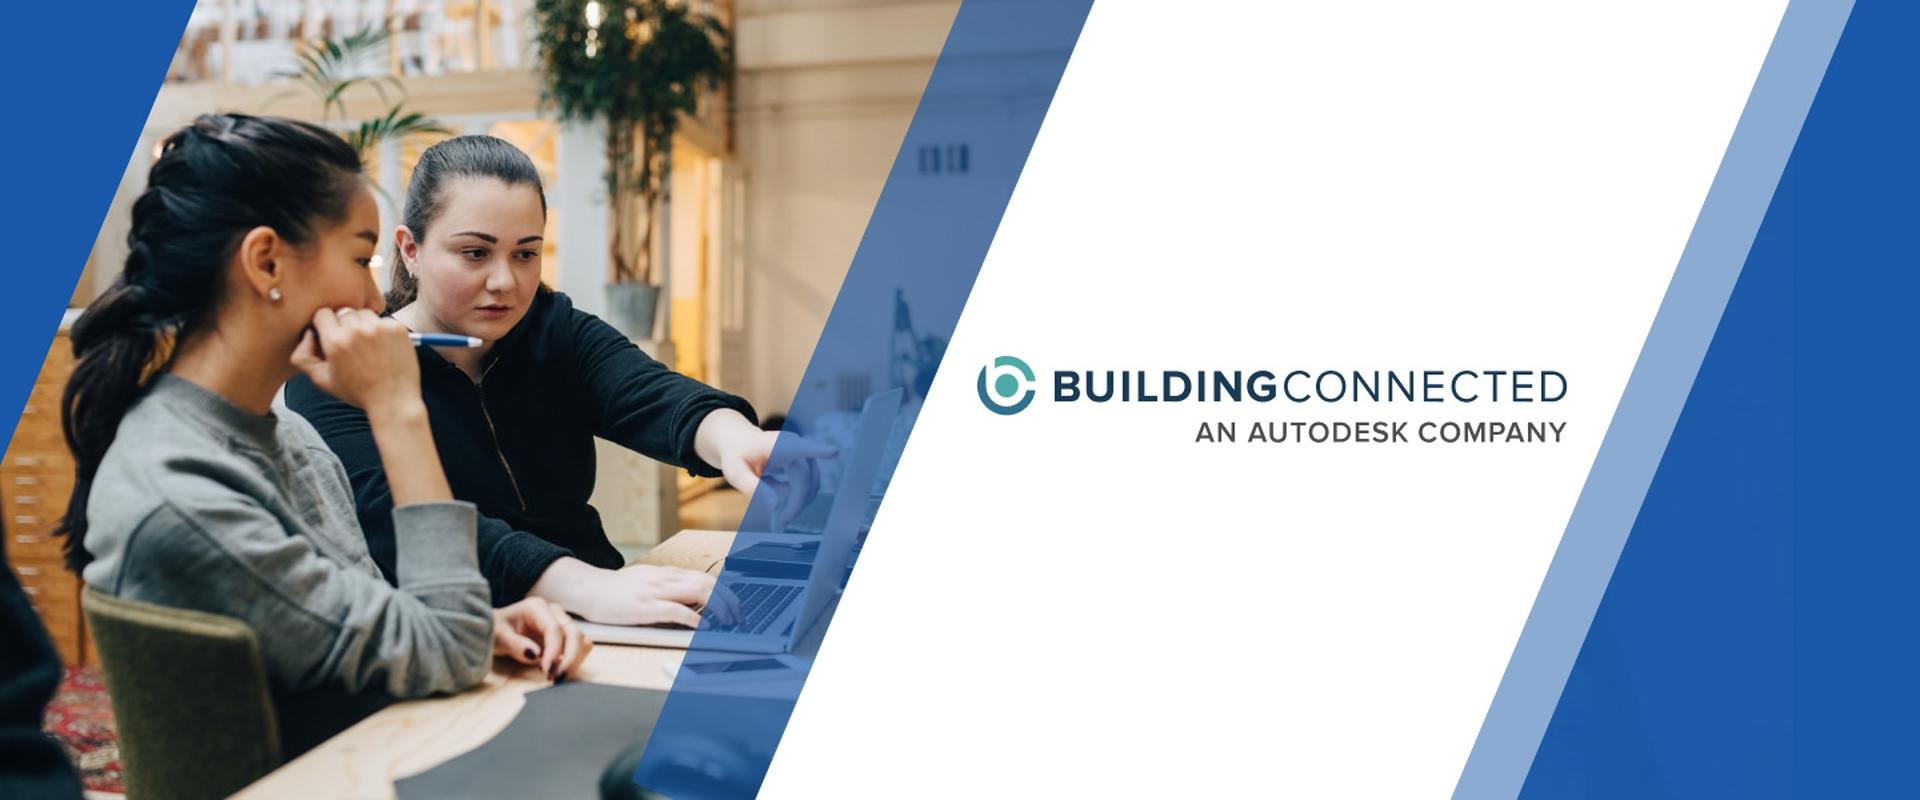 webinar-introducing-centralized-bid-management-win-more-work-with-buildingconnectedstoryblok-1440x600